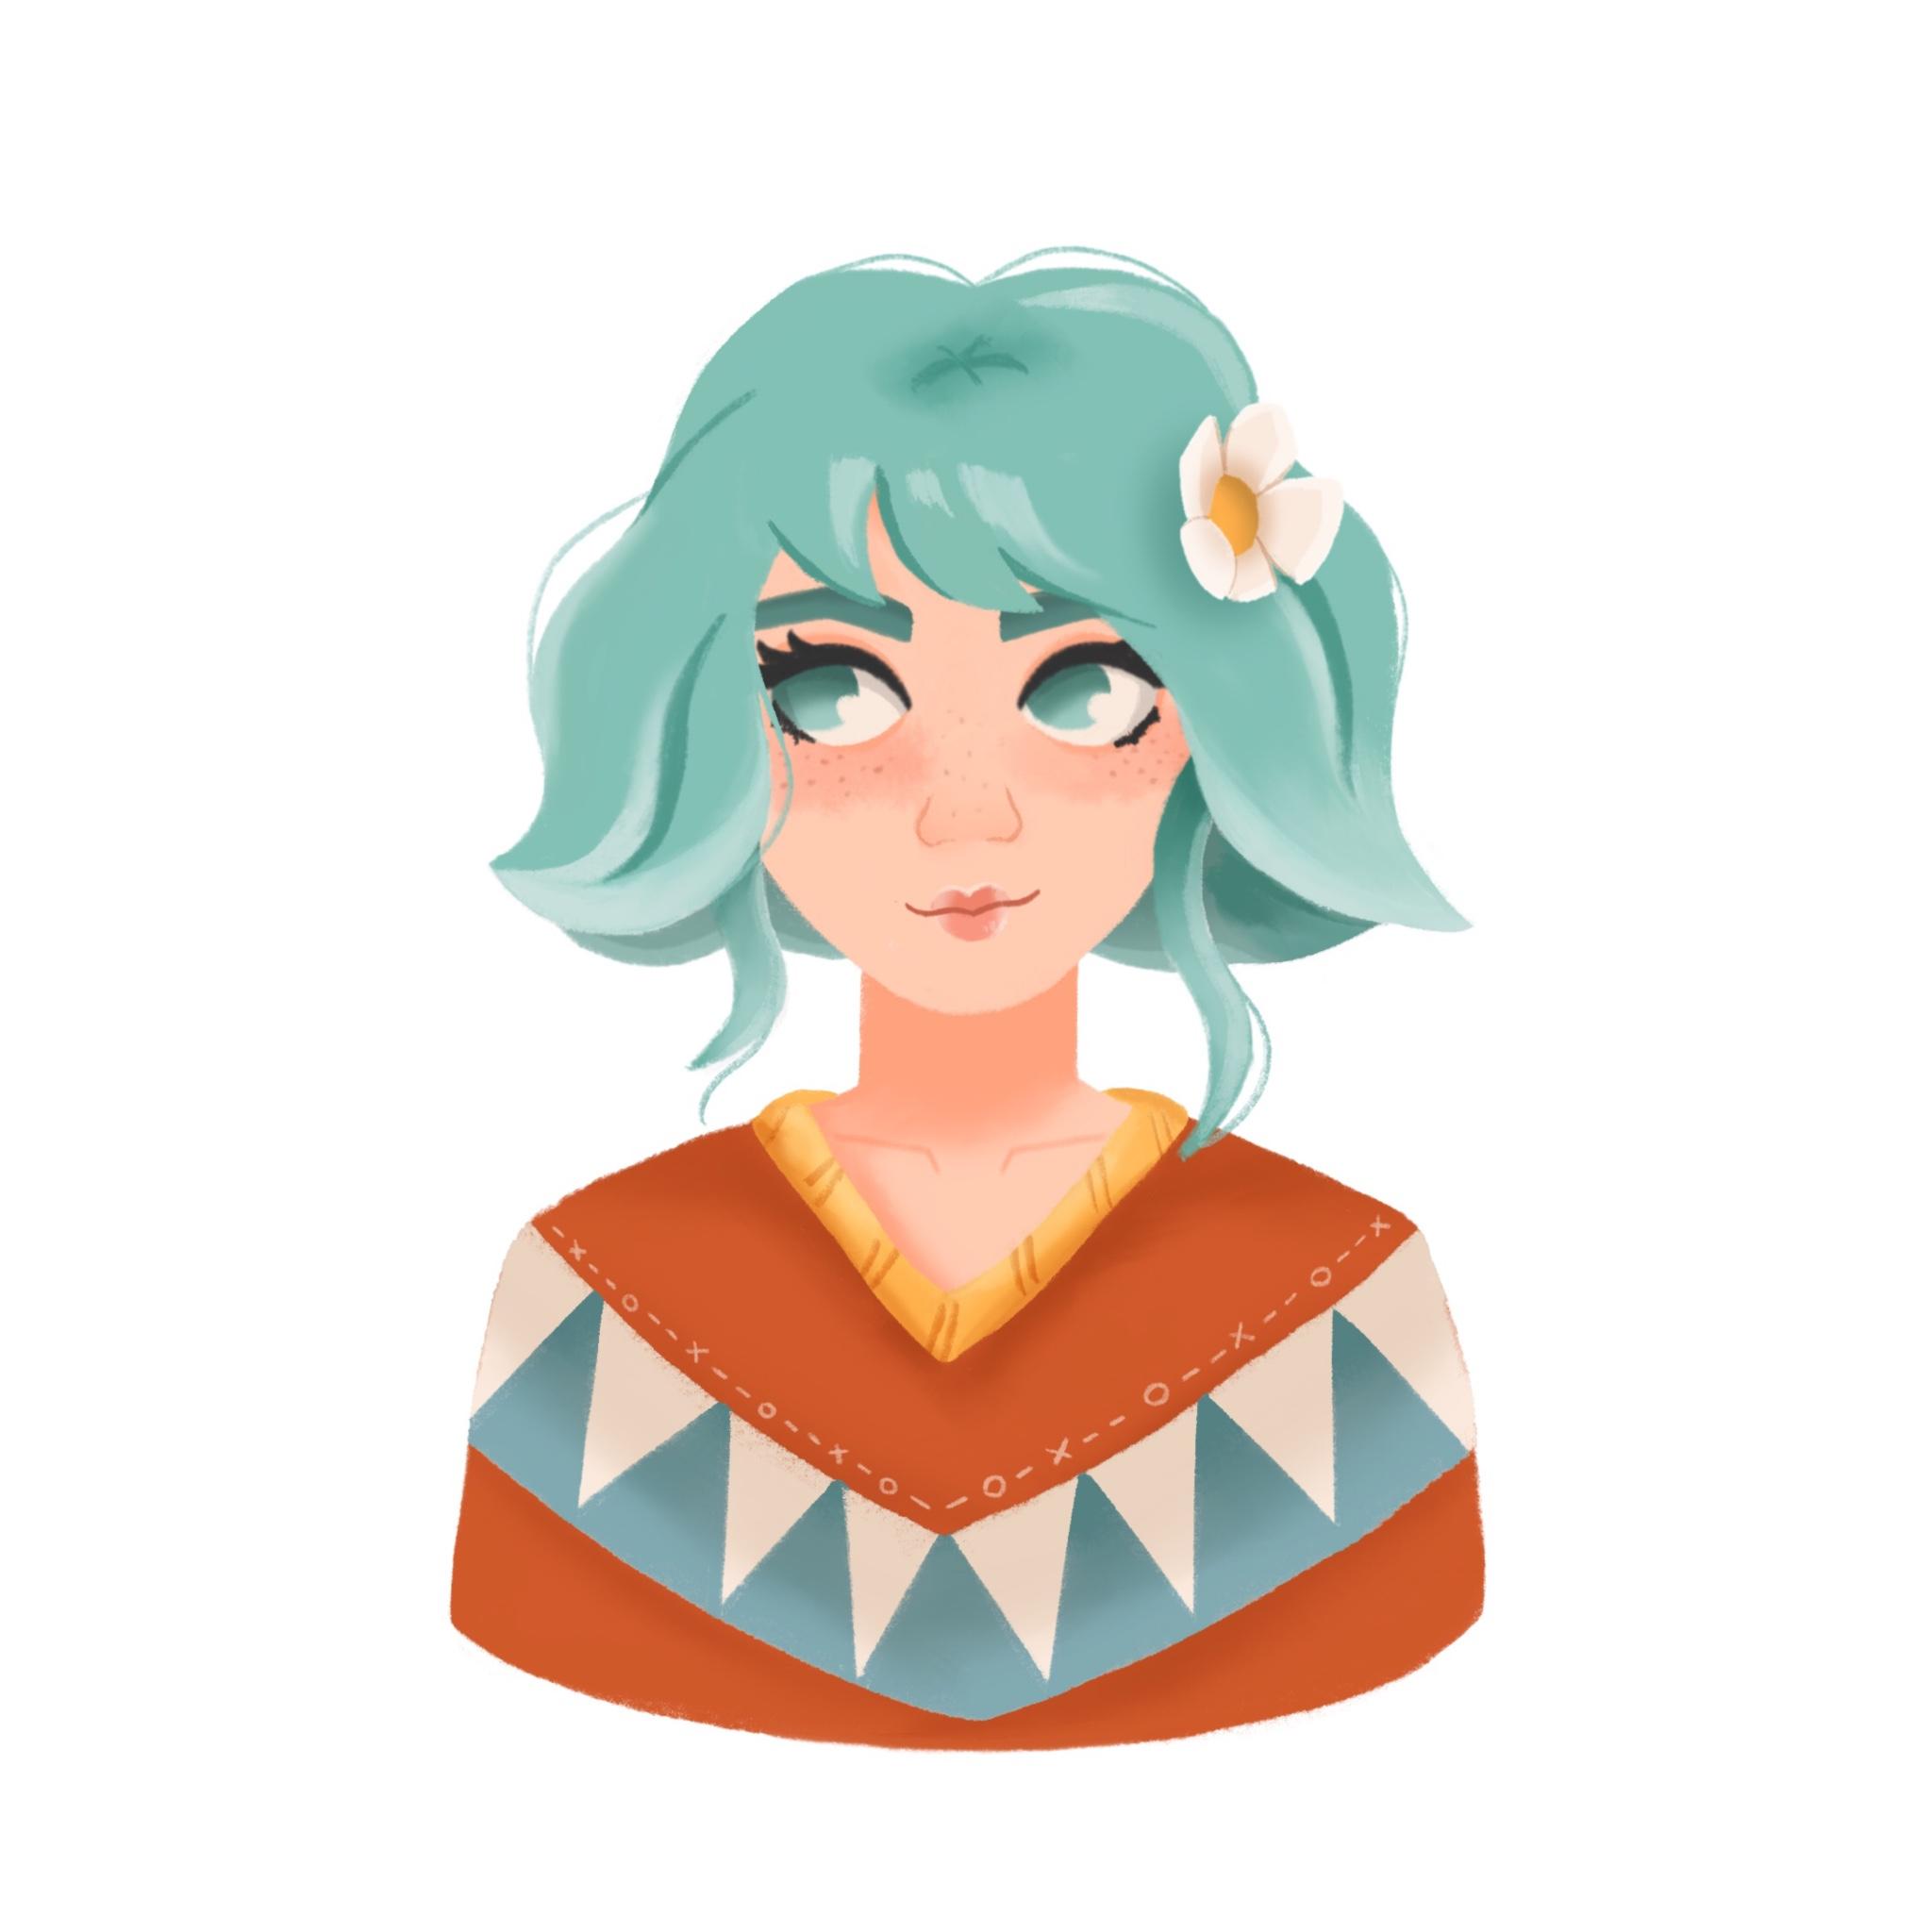 Original character belongs to @natnatart